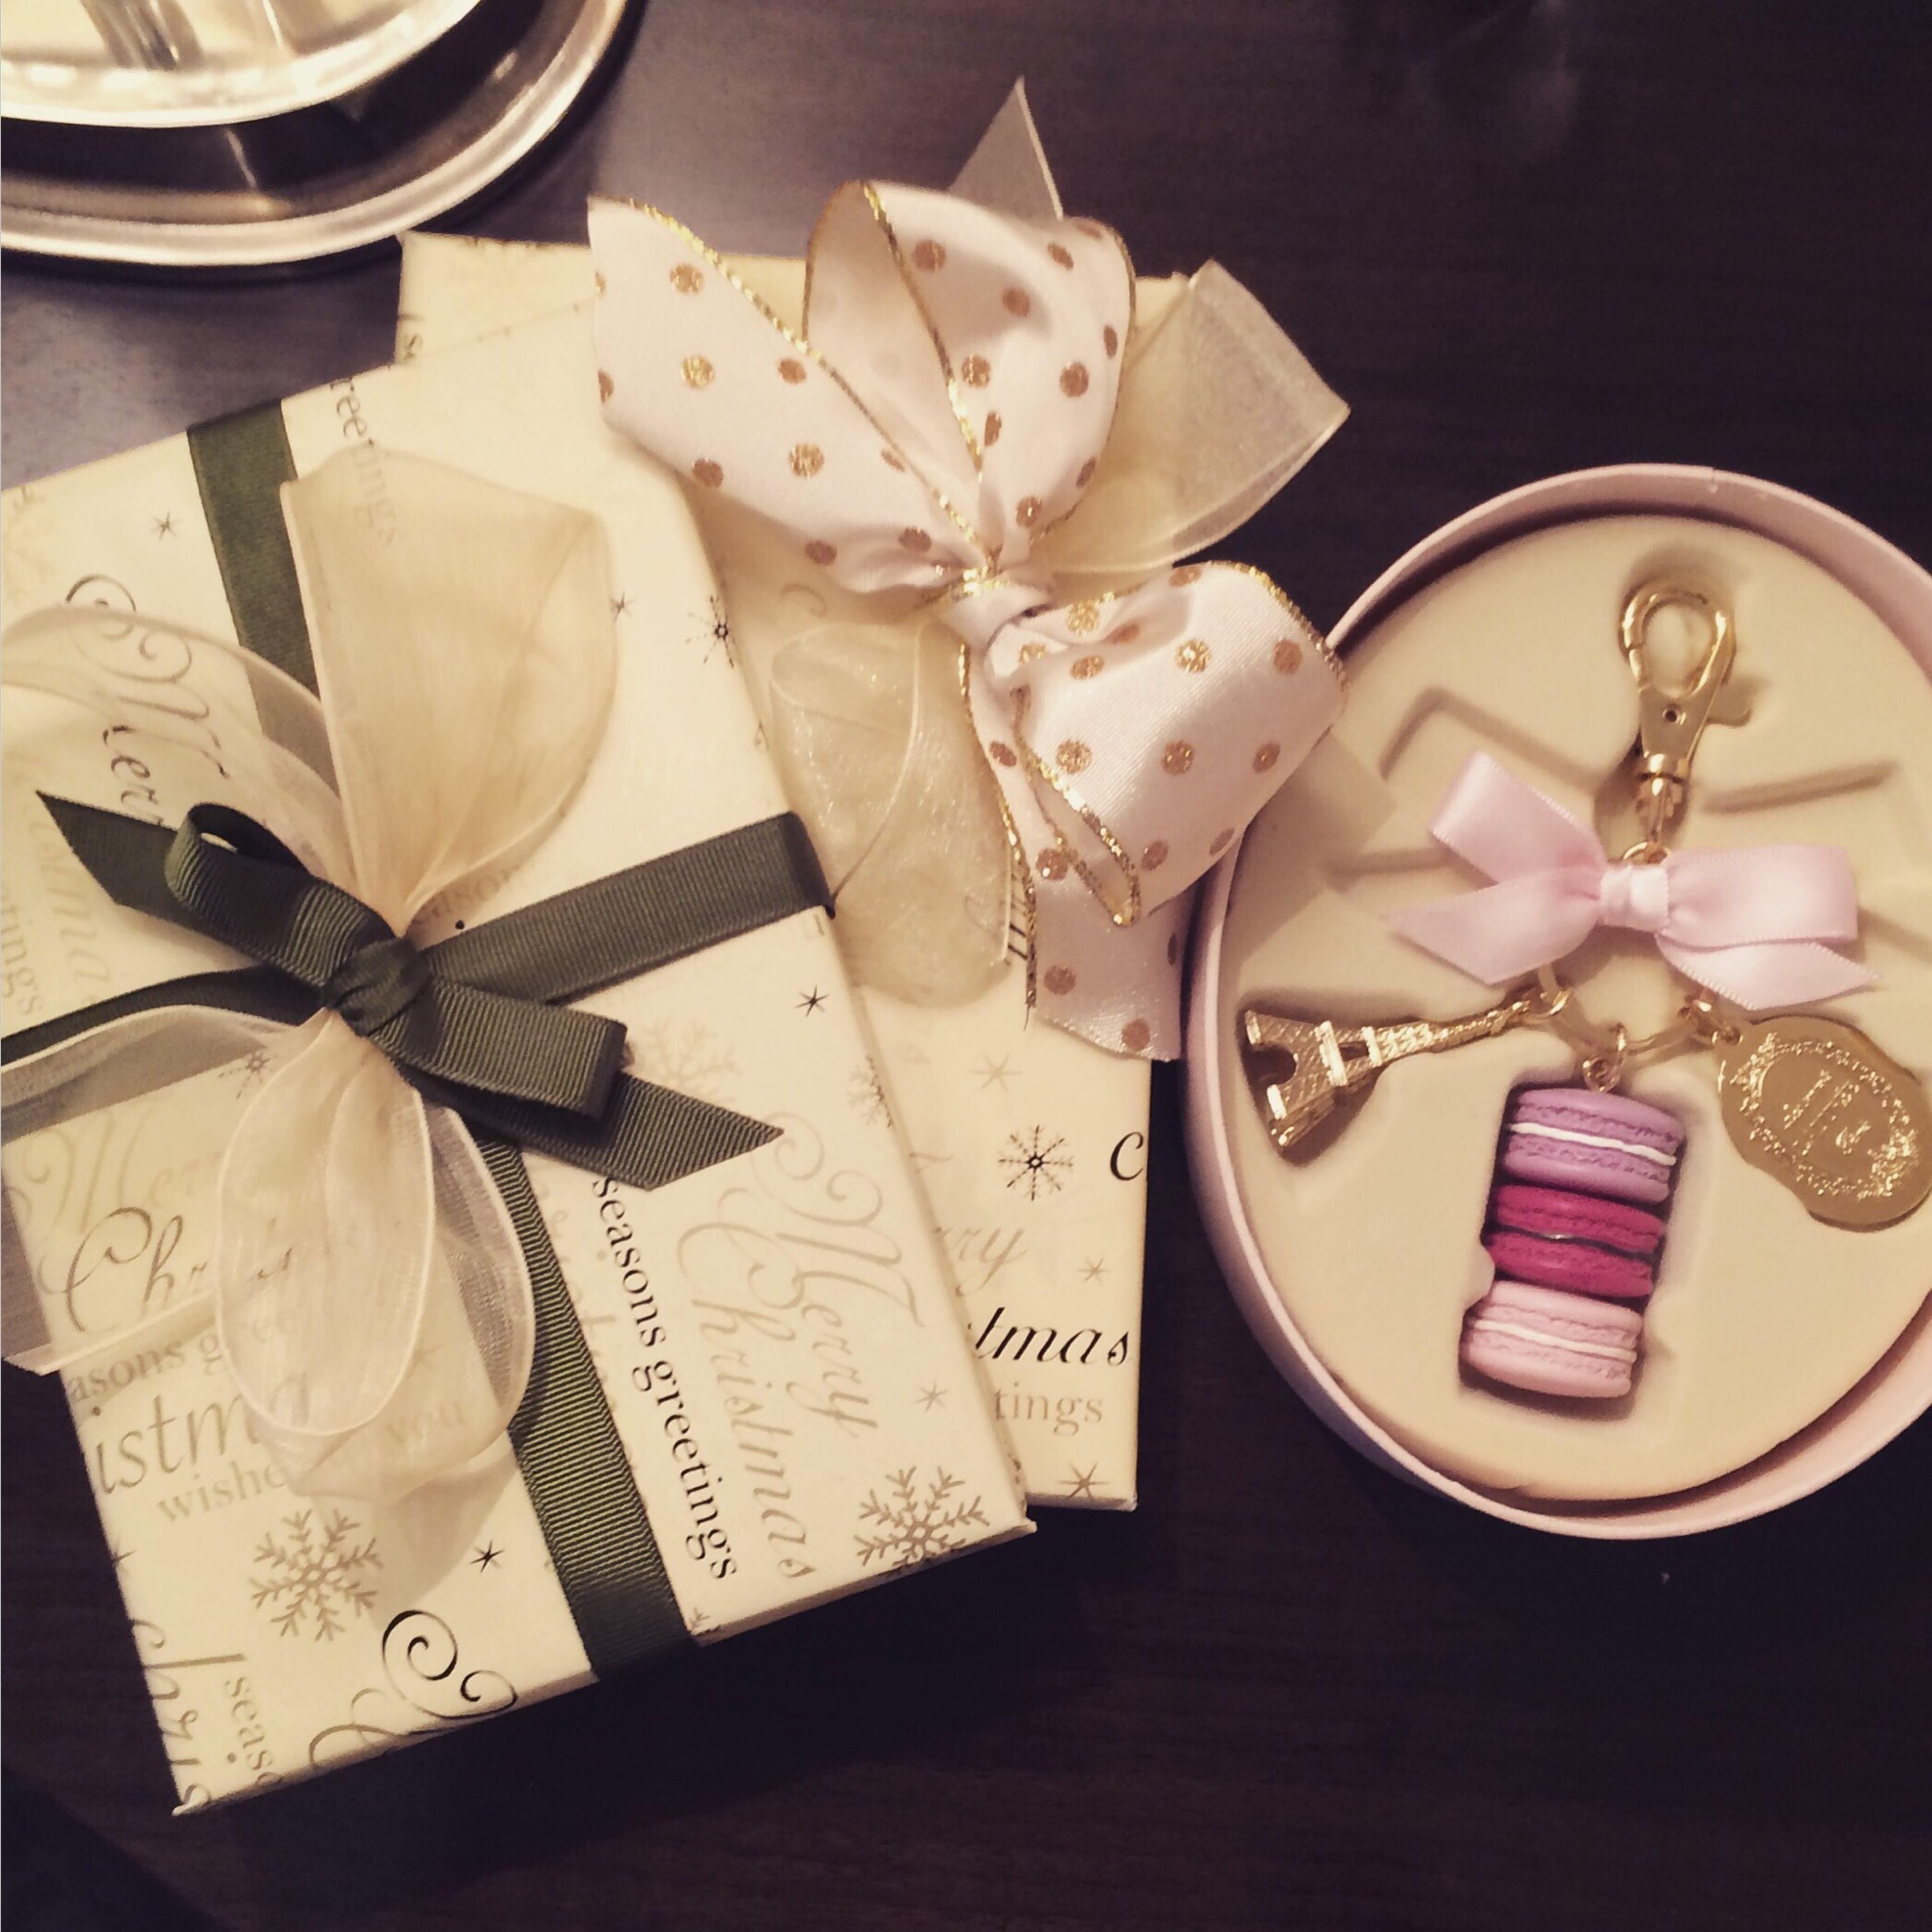 Moscow, First Christmas gifts Christmastime Enjoying Life